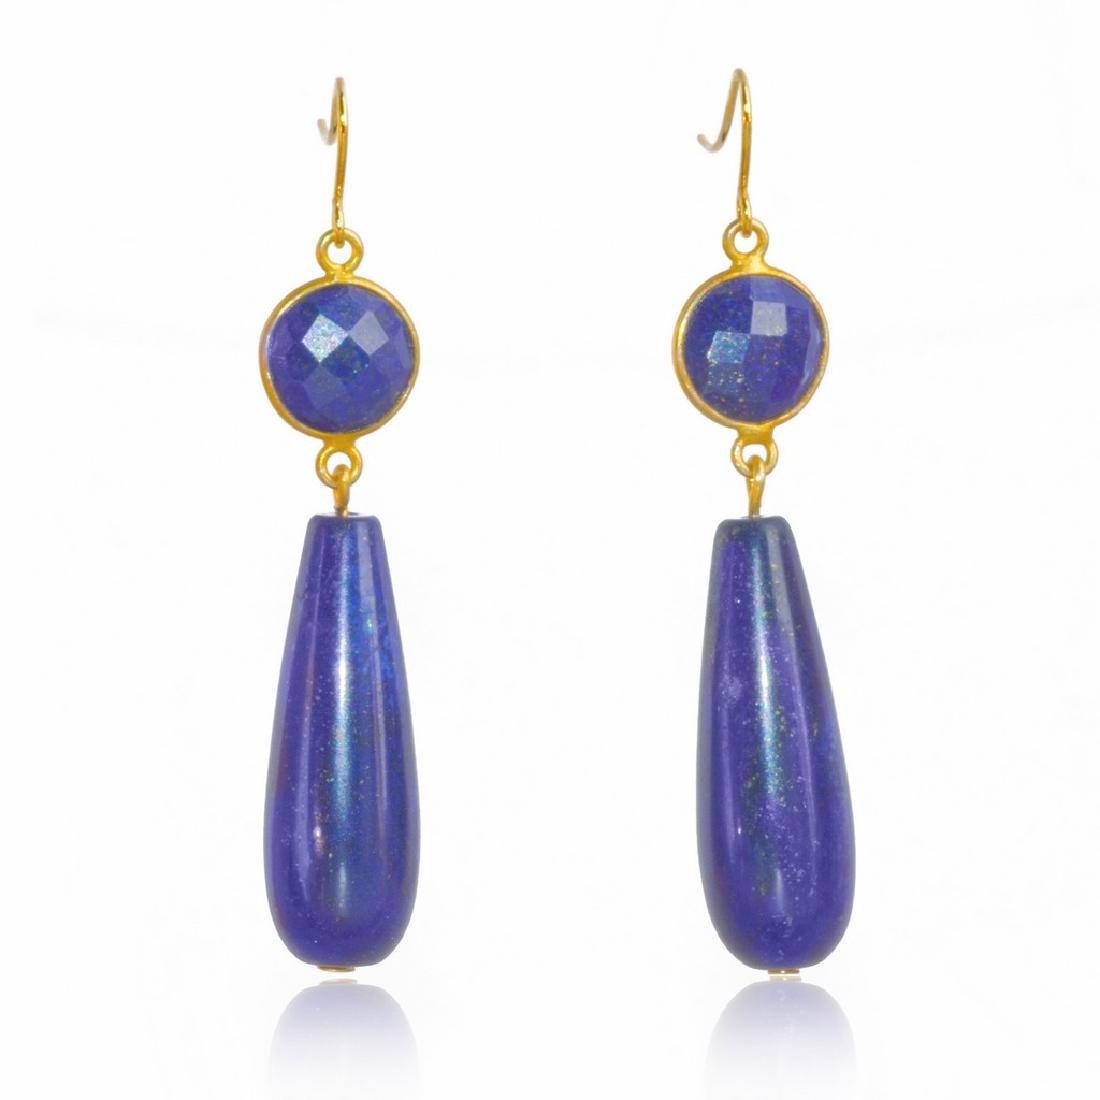 14K Gold Afghan Lapis Lazuli Art Deco Style Earrings